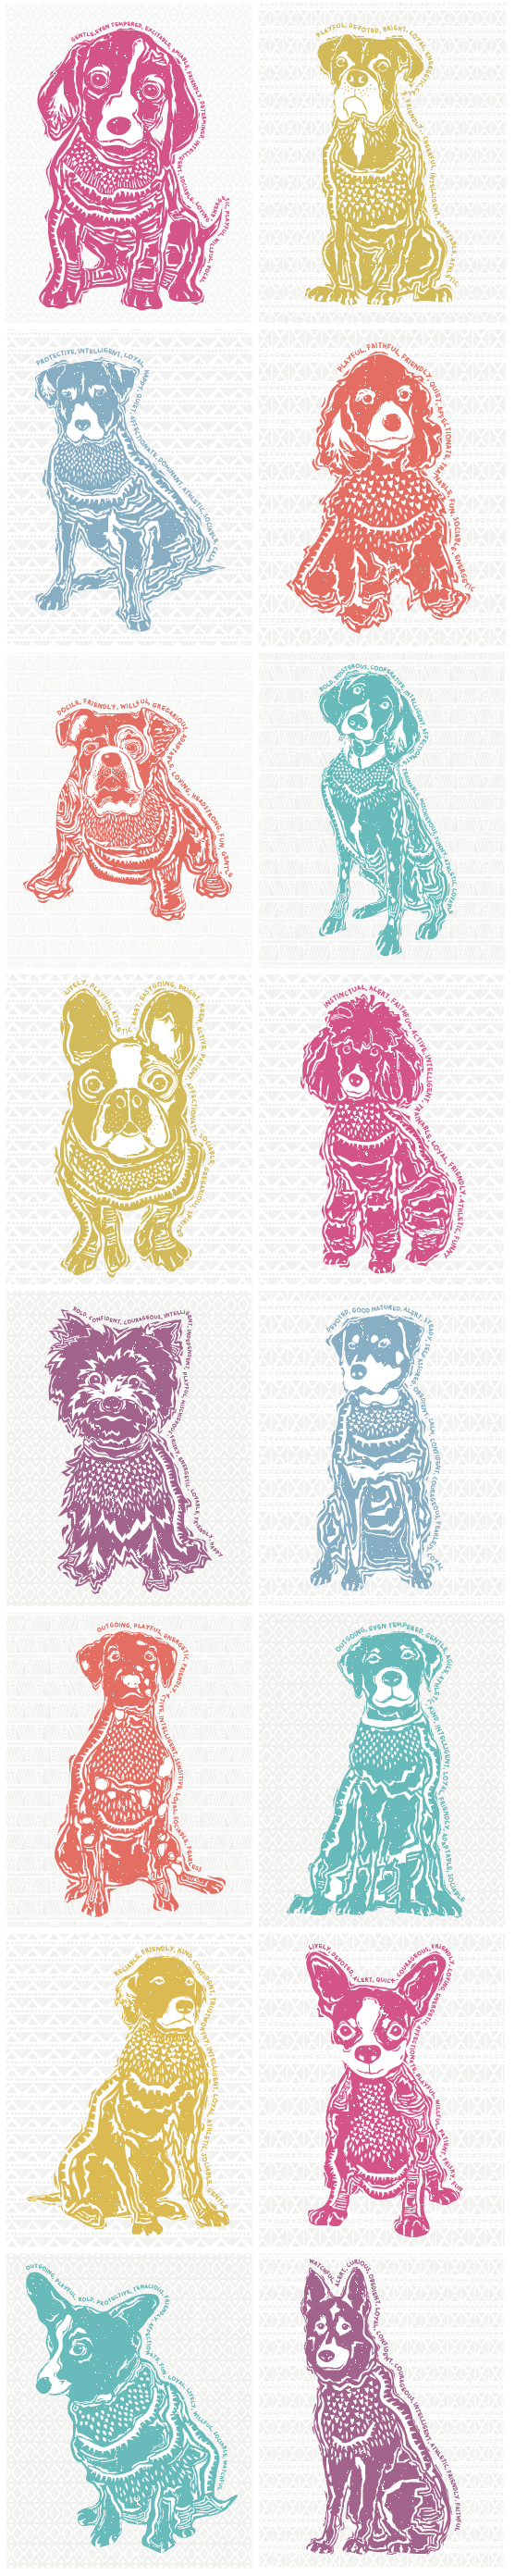 Linocut Dog Art Prints